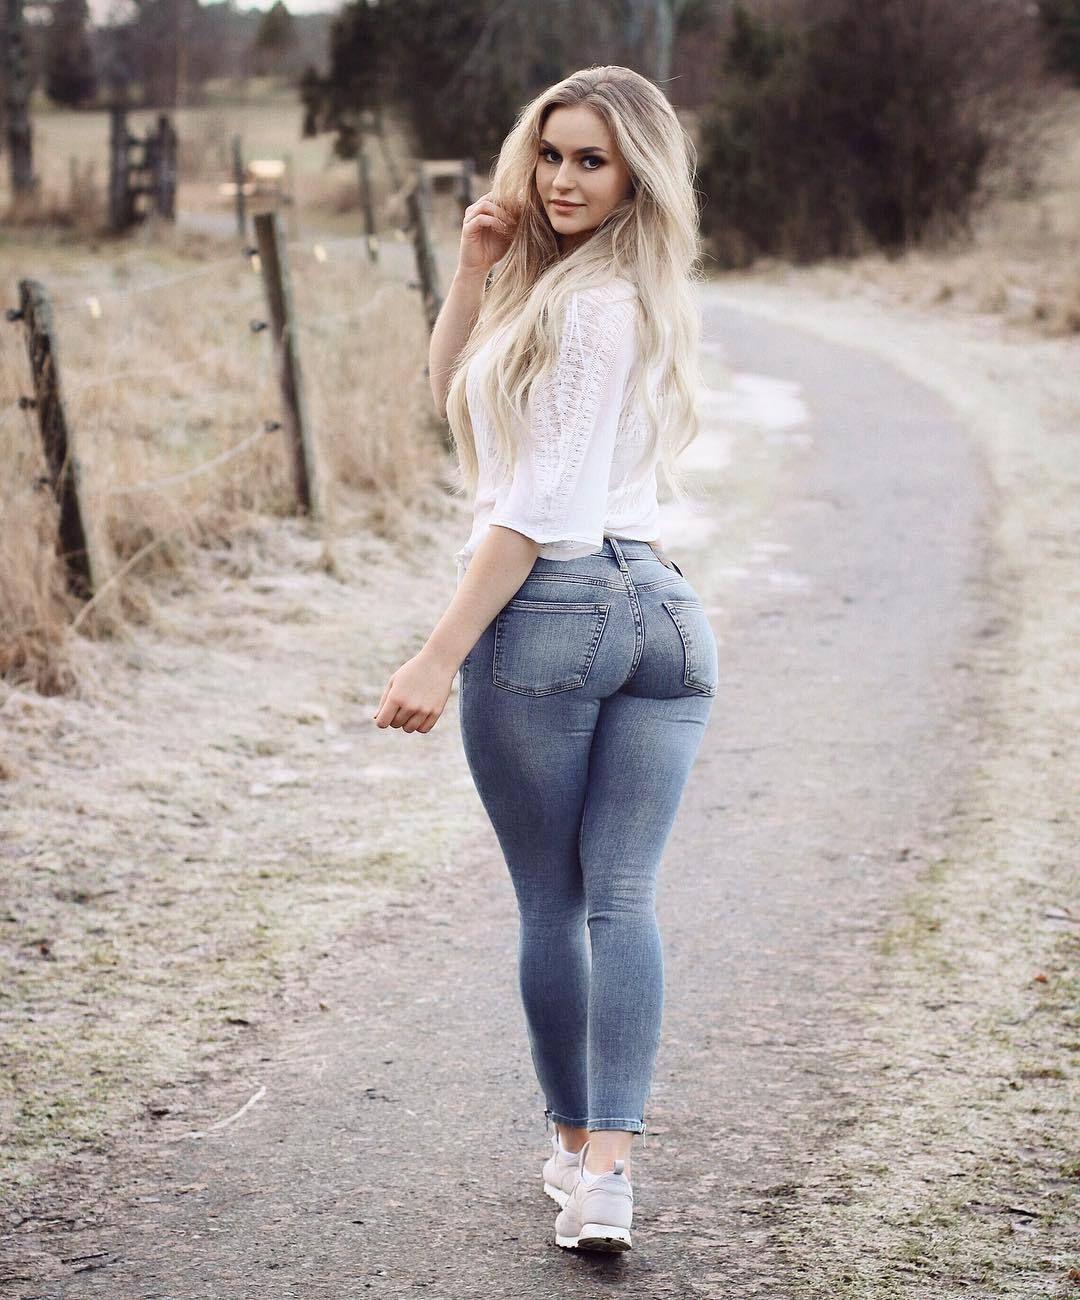 foto de tight pants: Anna Nyström Mujeres lindas